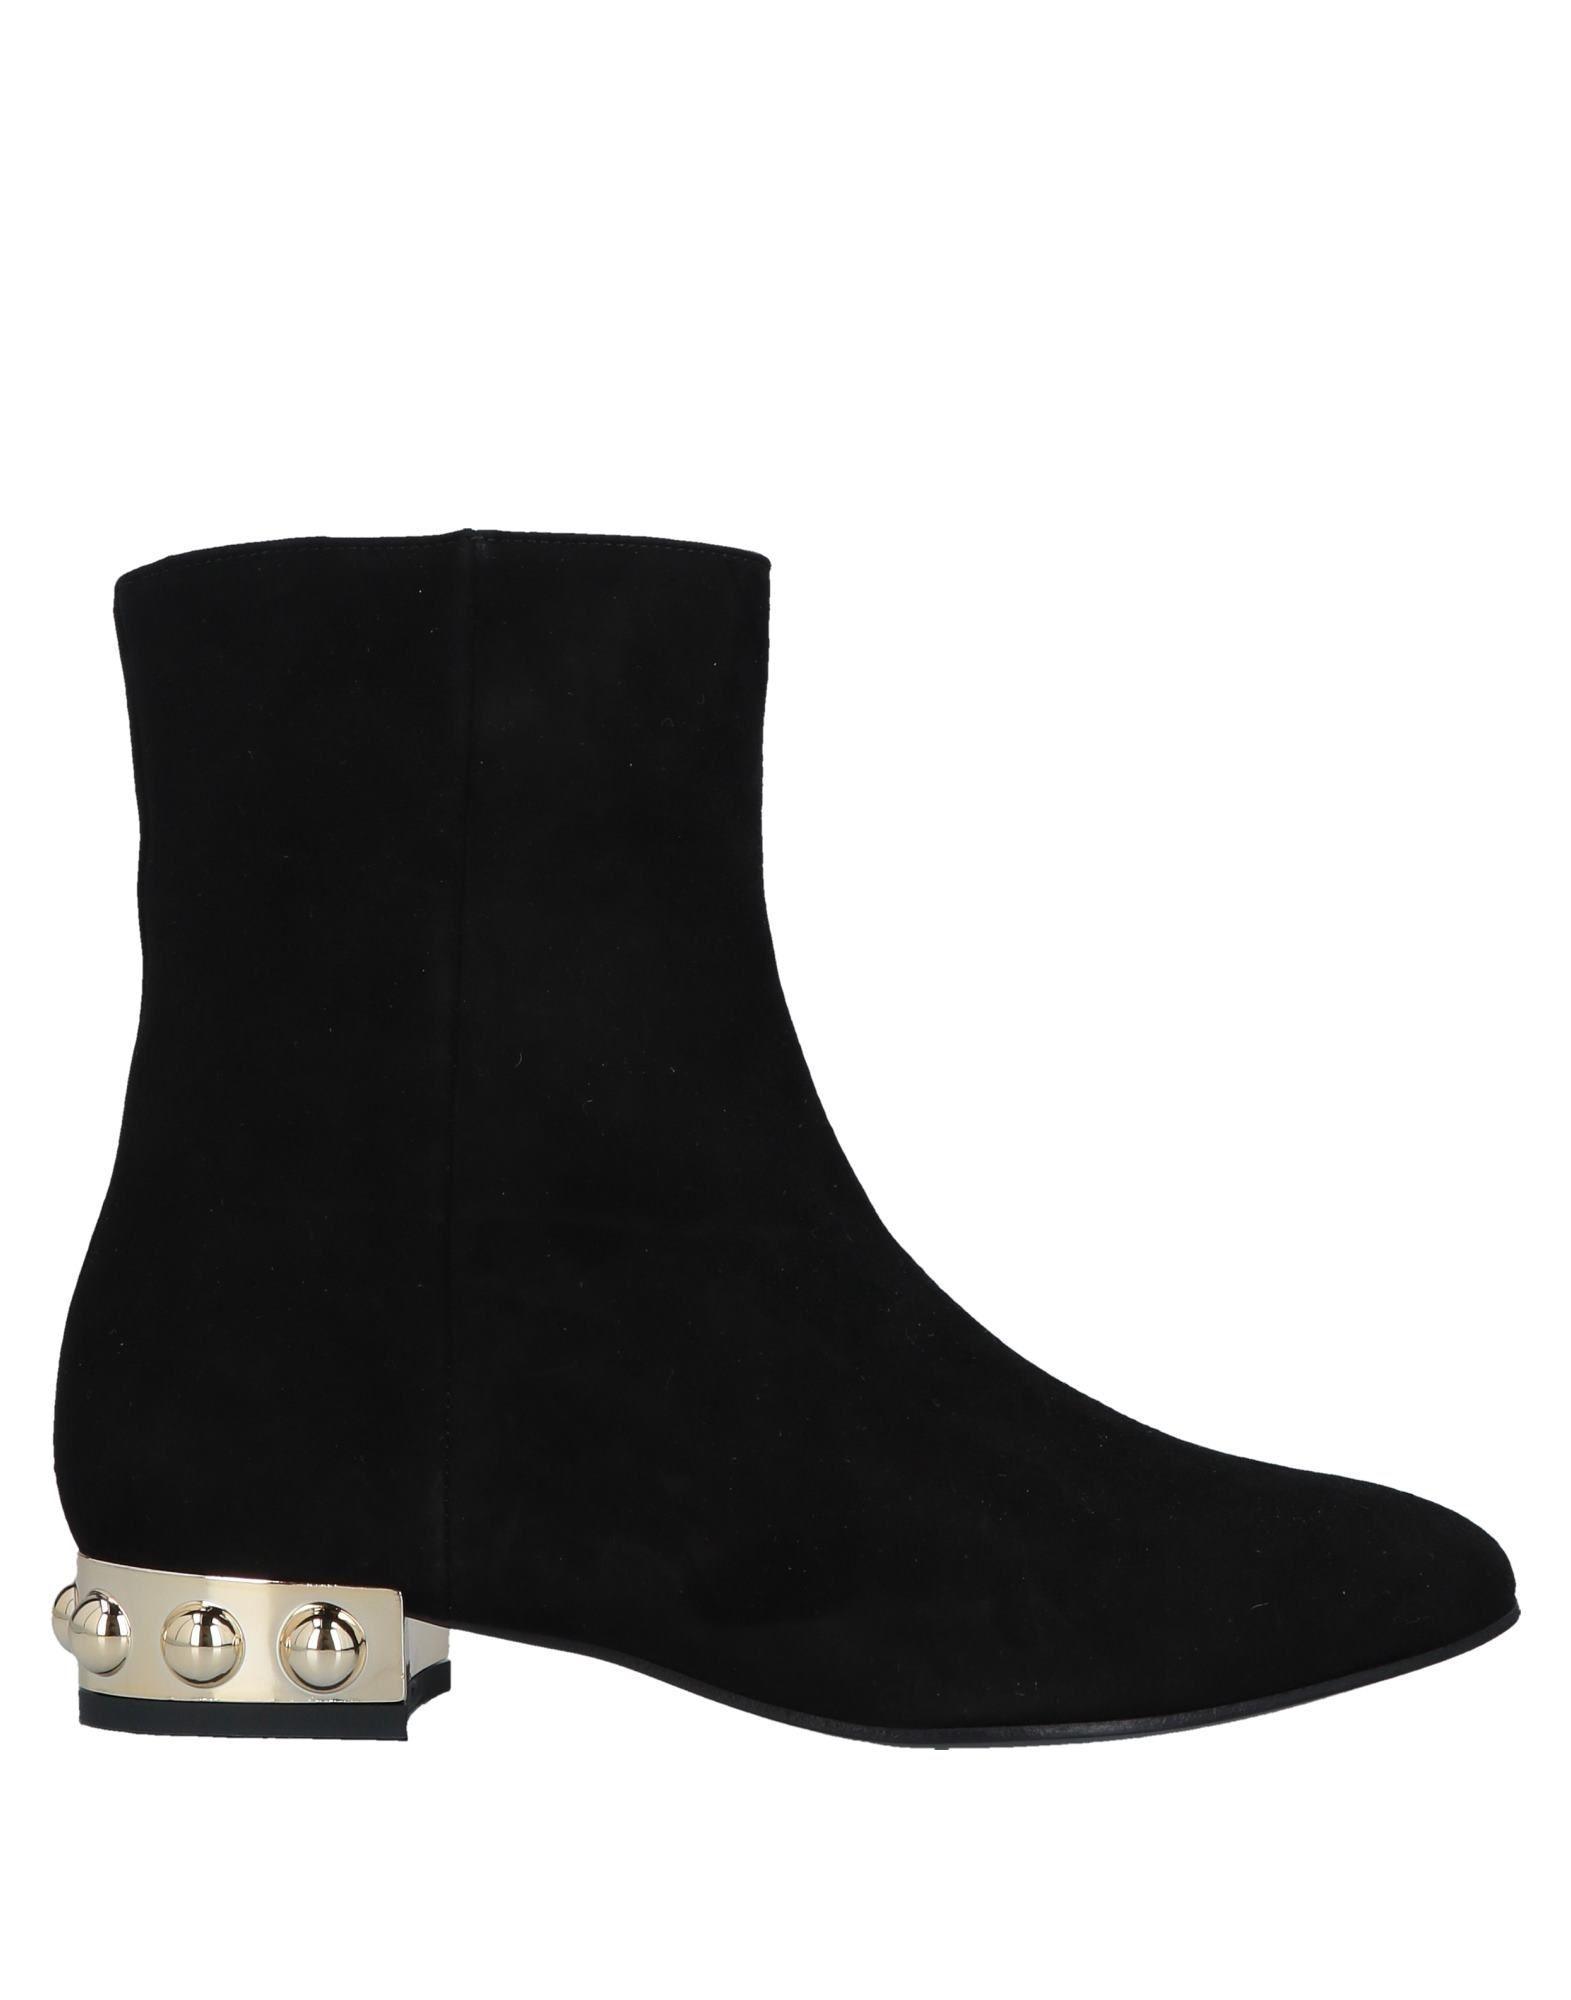 63b688a6e68b Lyst - Marc Ellis Ankle Boots in Black